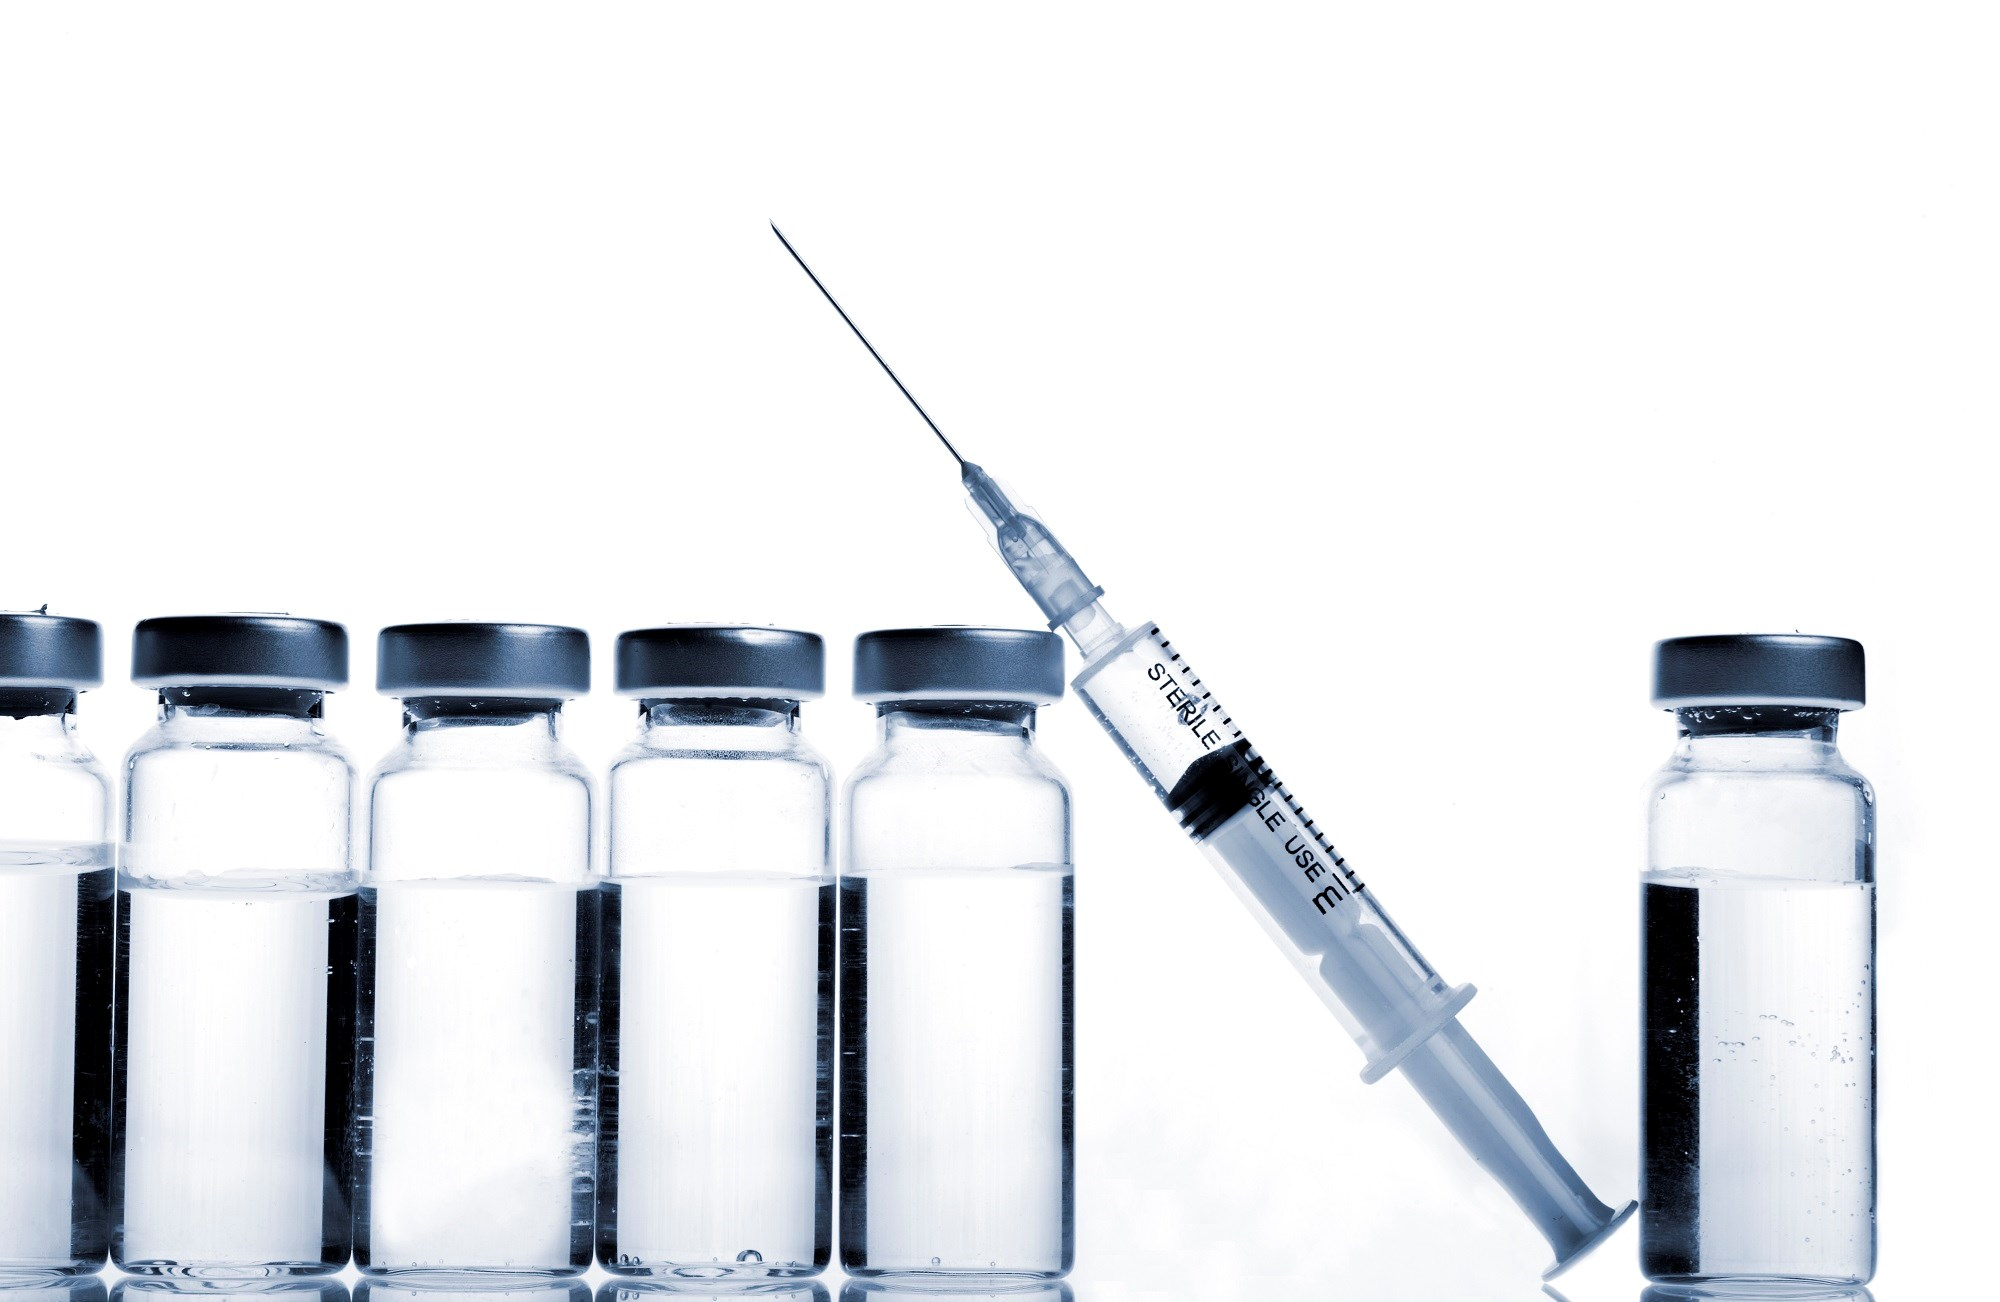 OnabotulinumtoxinA for Post-Stroke Spasticity: Treatment Strategies and Limitations